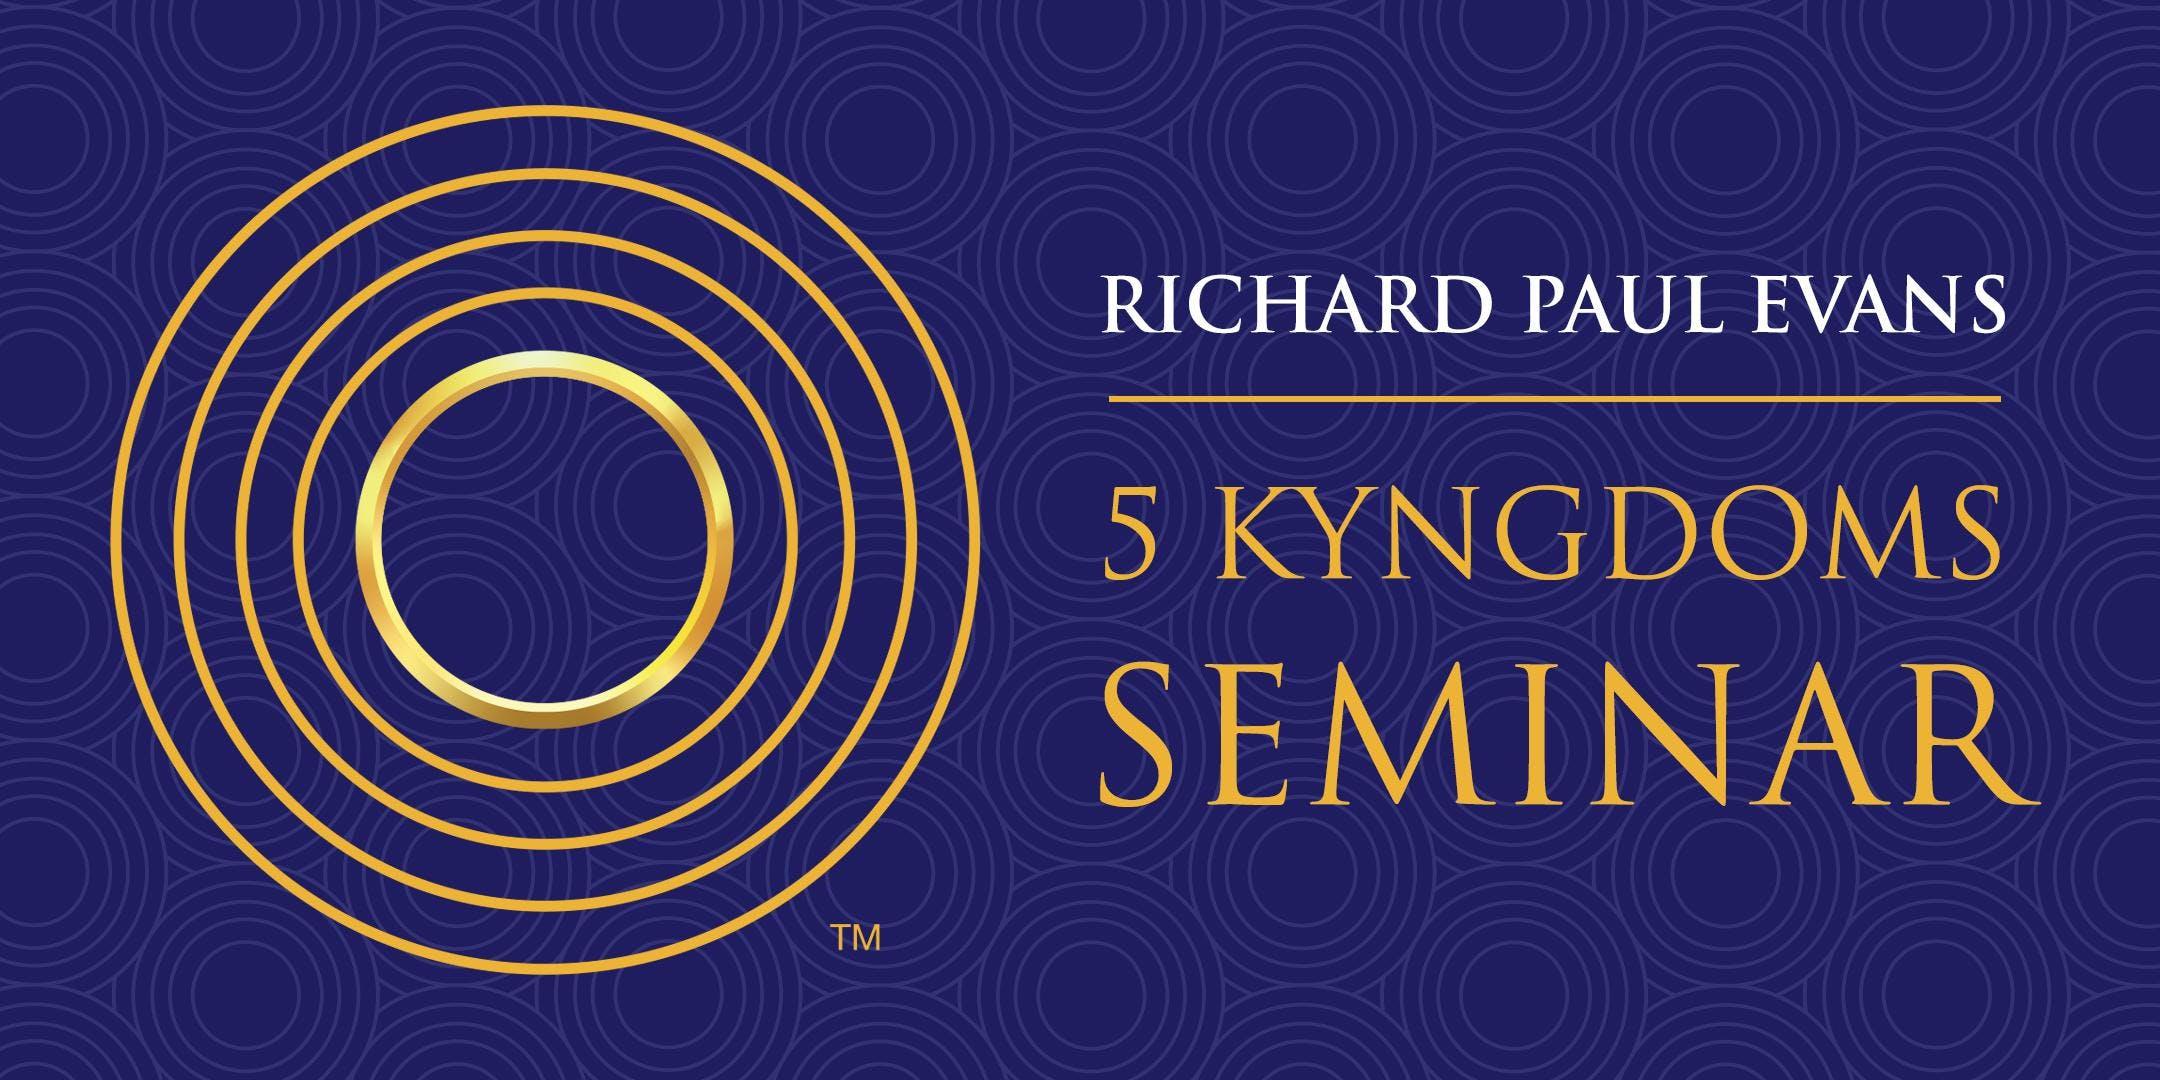 Richard Paul Evans 5 Kingdoms Training (Scottsdale)